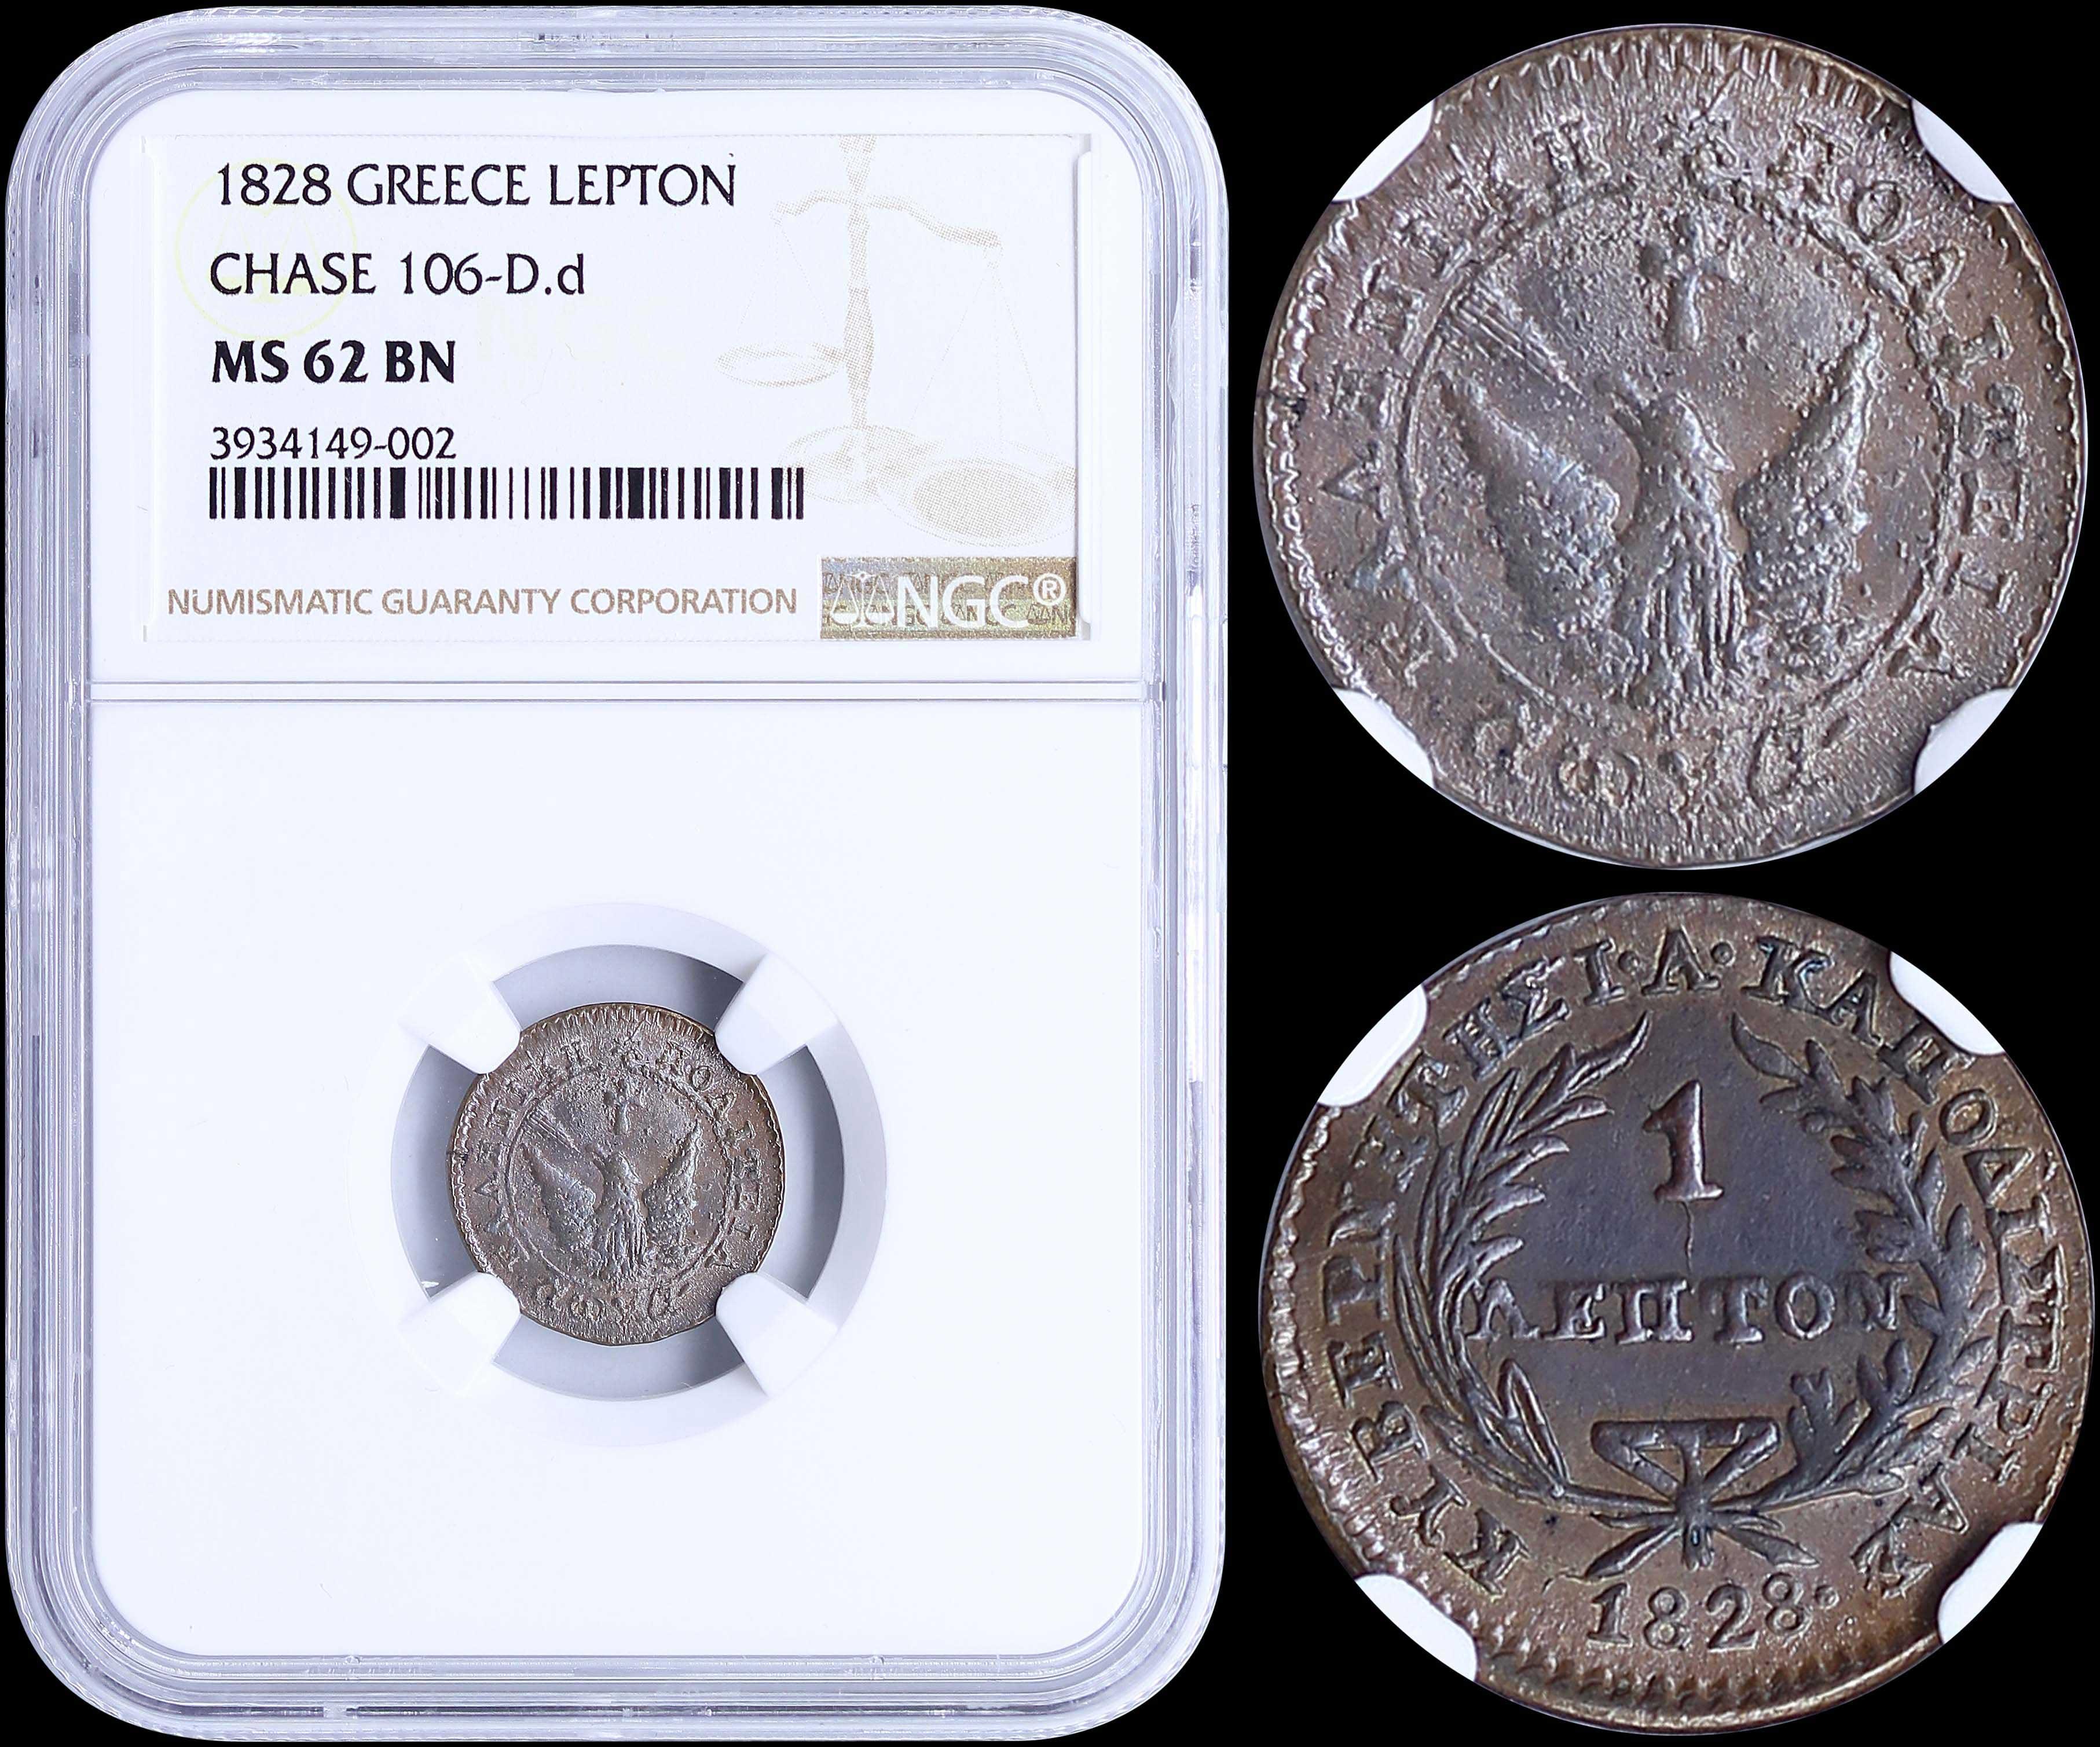 Lot 8004 - -  COINS & TOKENS governor capodistrias -  A. Karamitsos Public & Live Bid Auction 644 Coins, Medals & Banknotes